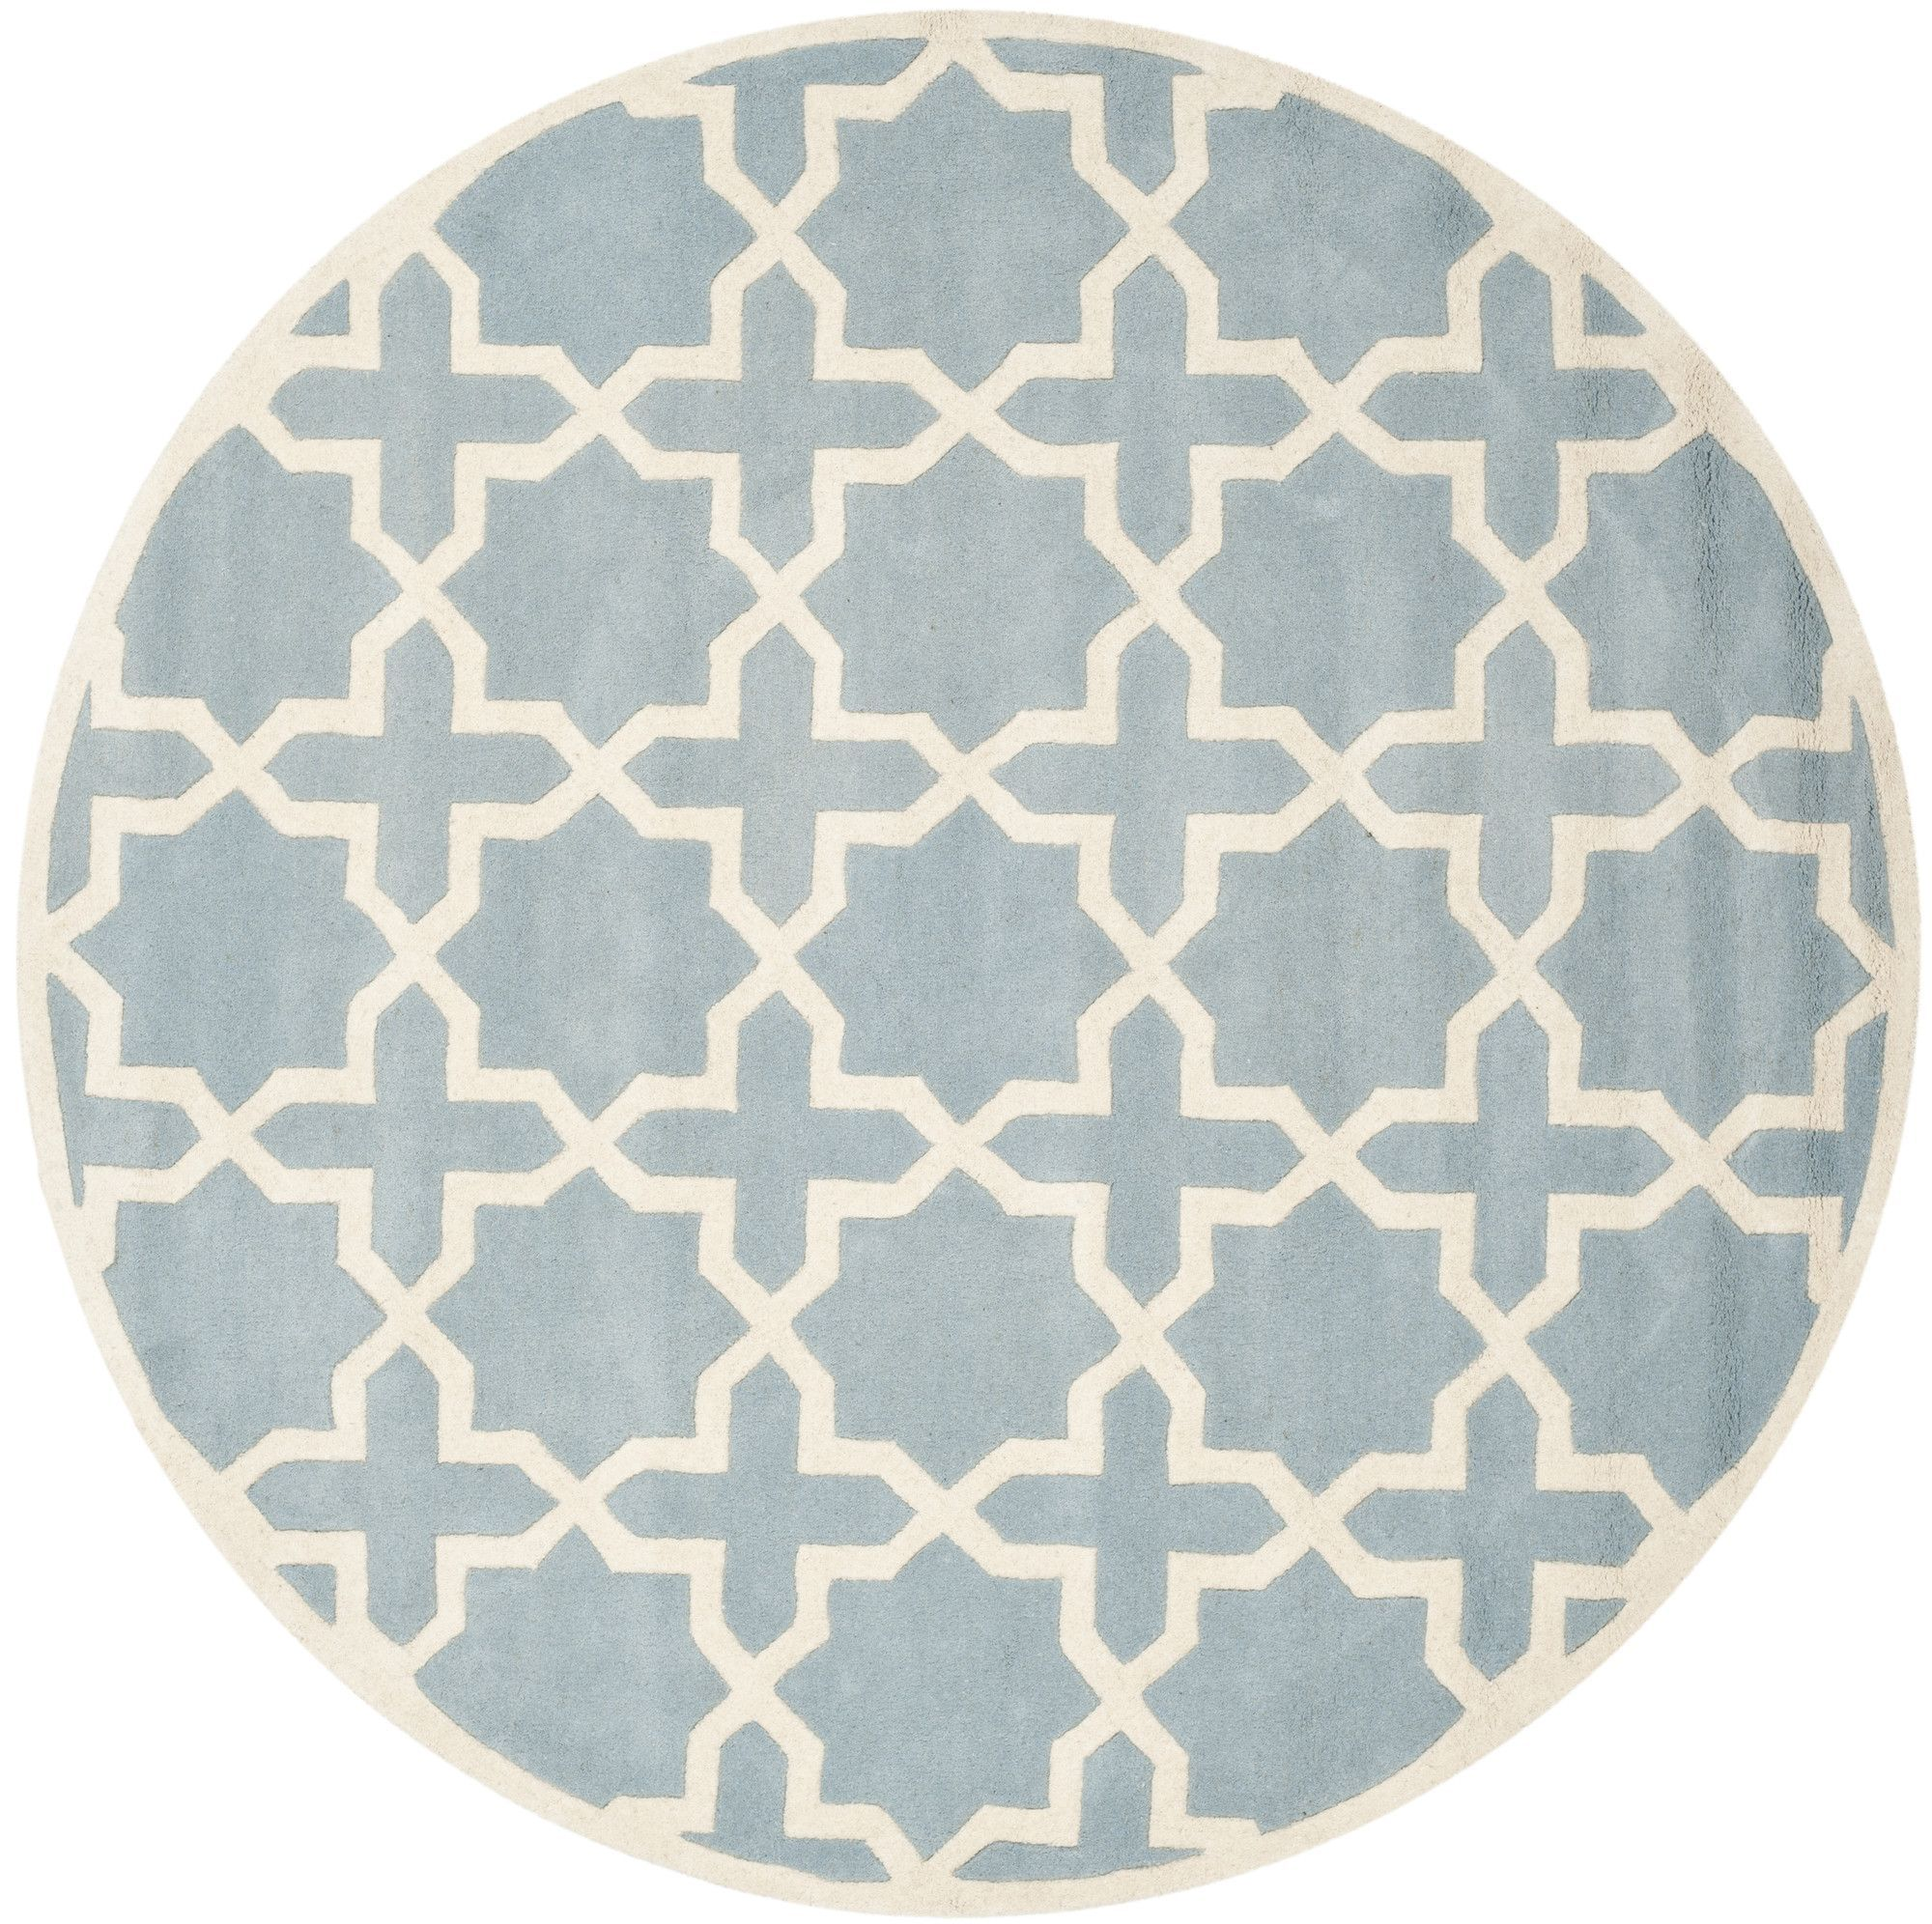 Chatham Blue & Ivory Area Rug Geometric area rug, Blue